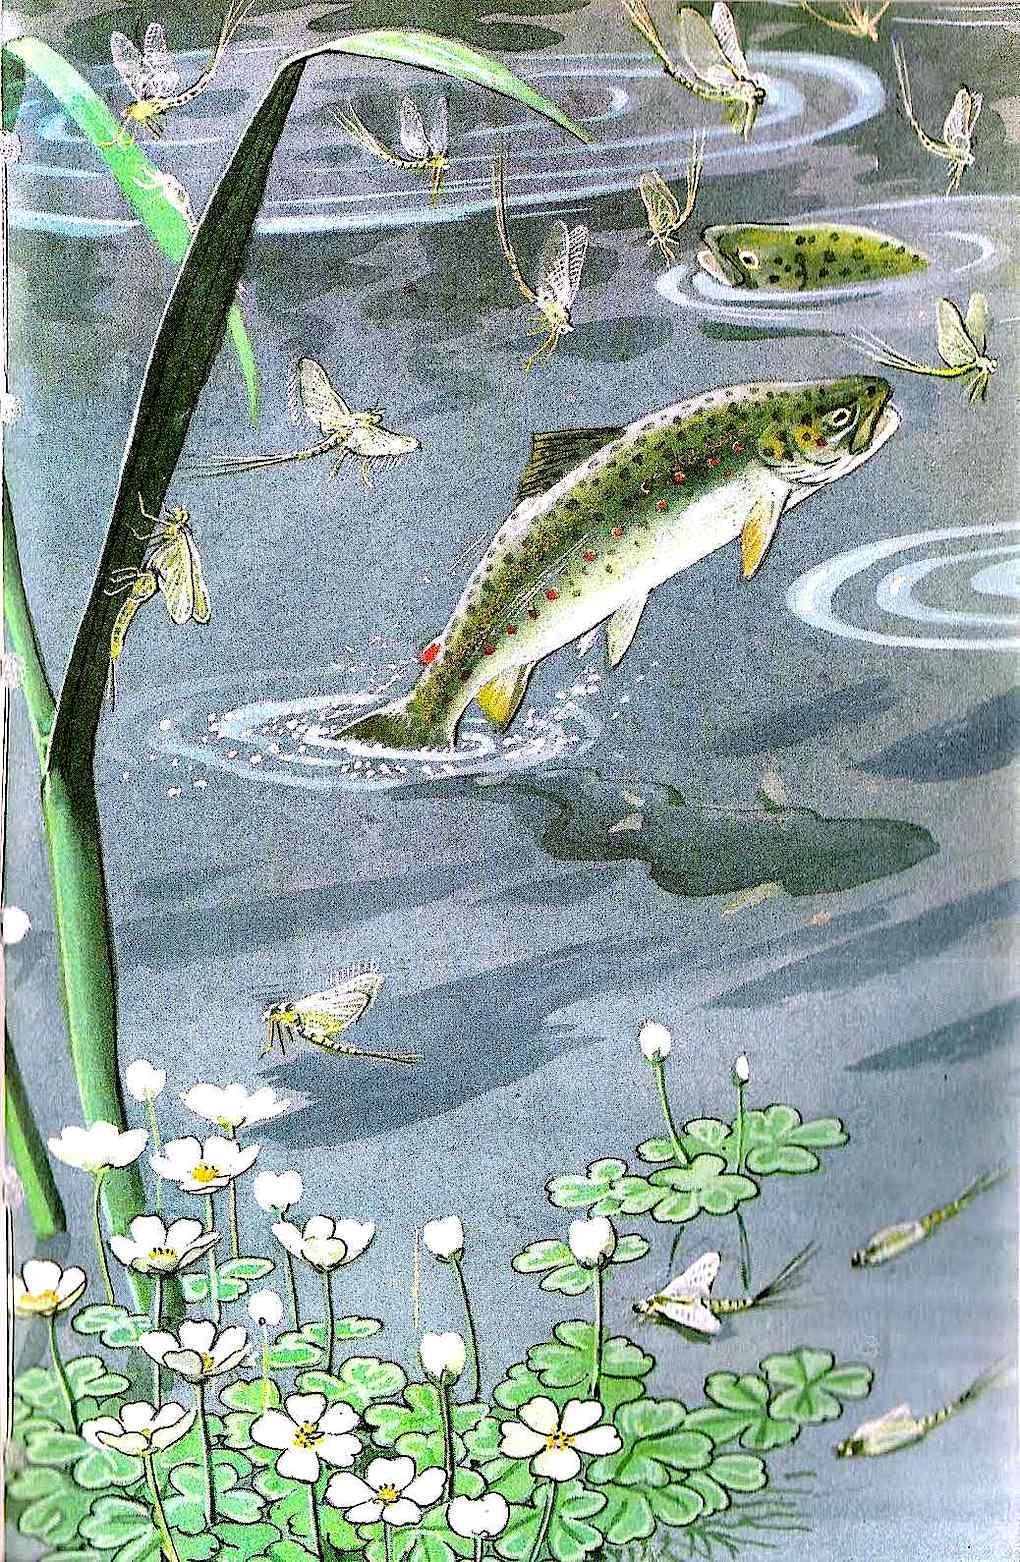 a Charles Tunnicliffe illustration of jumping feeding fish